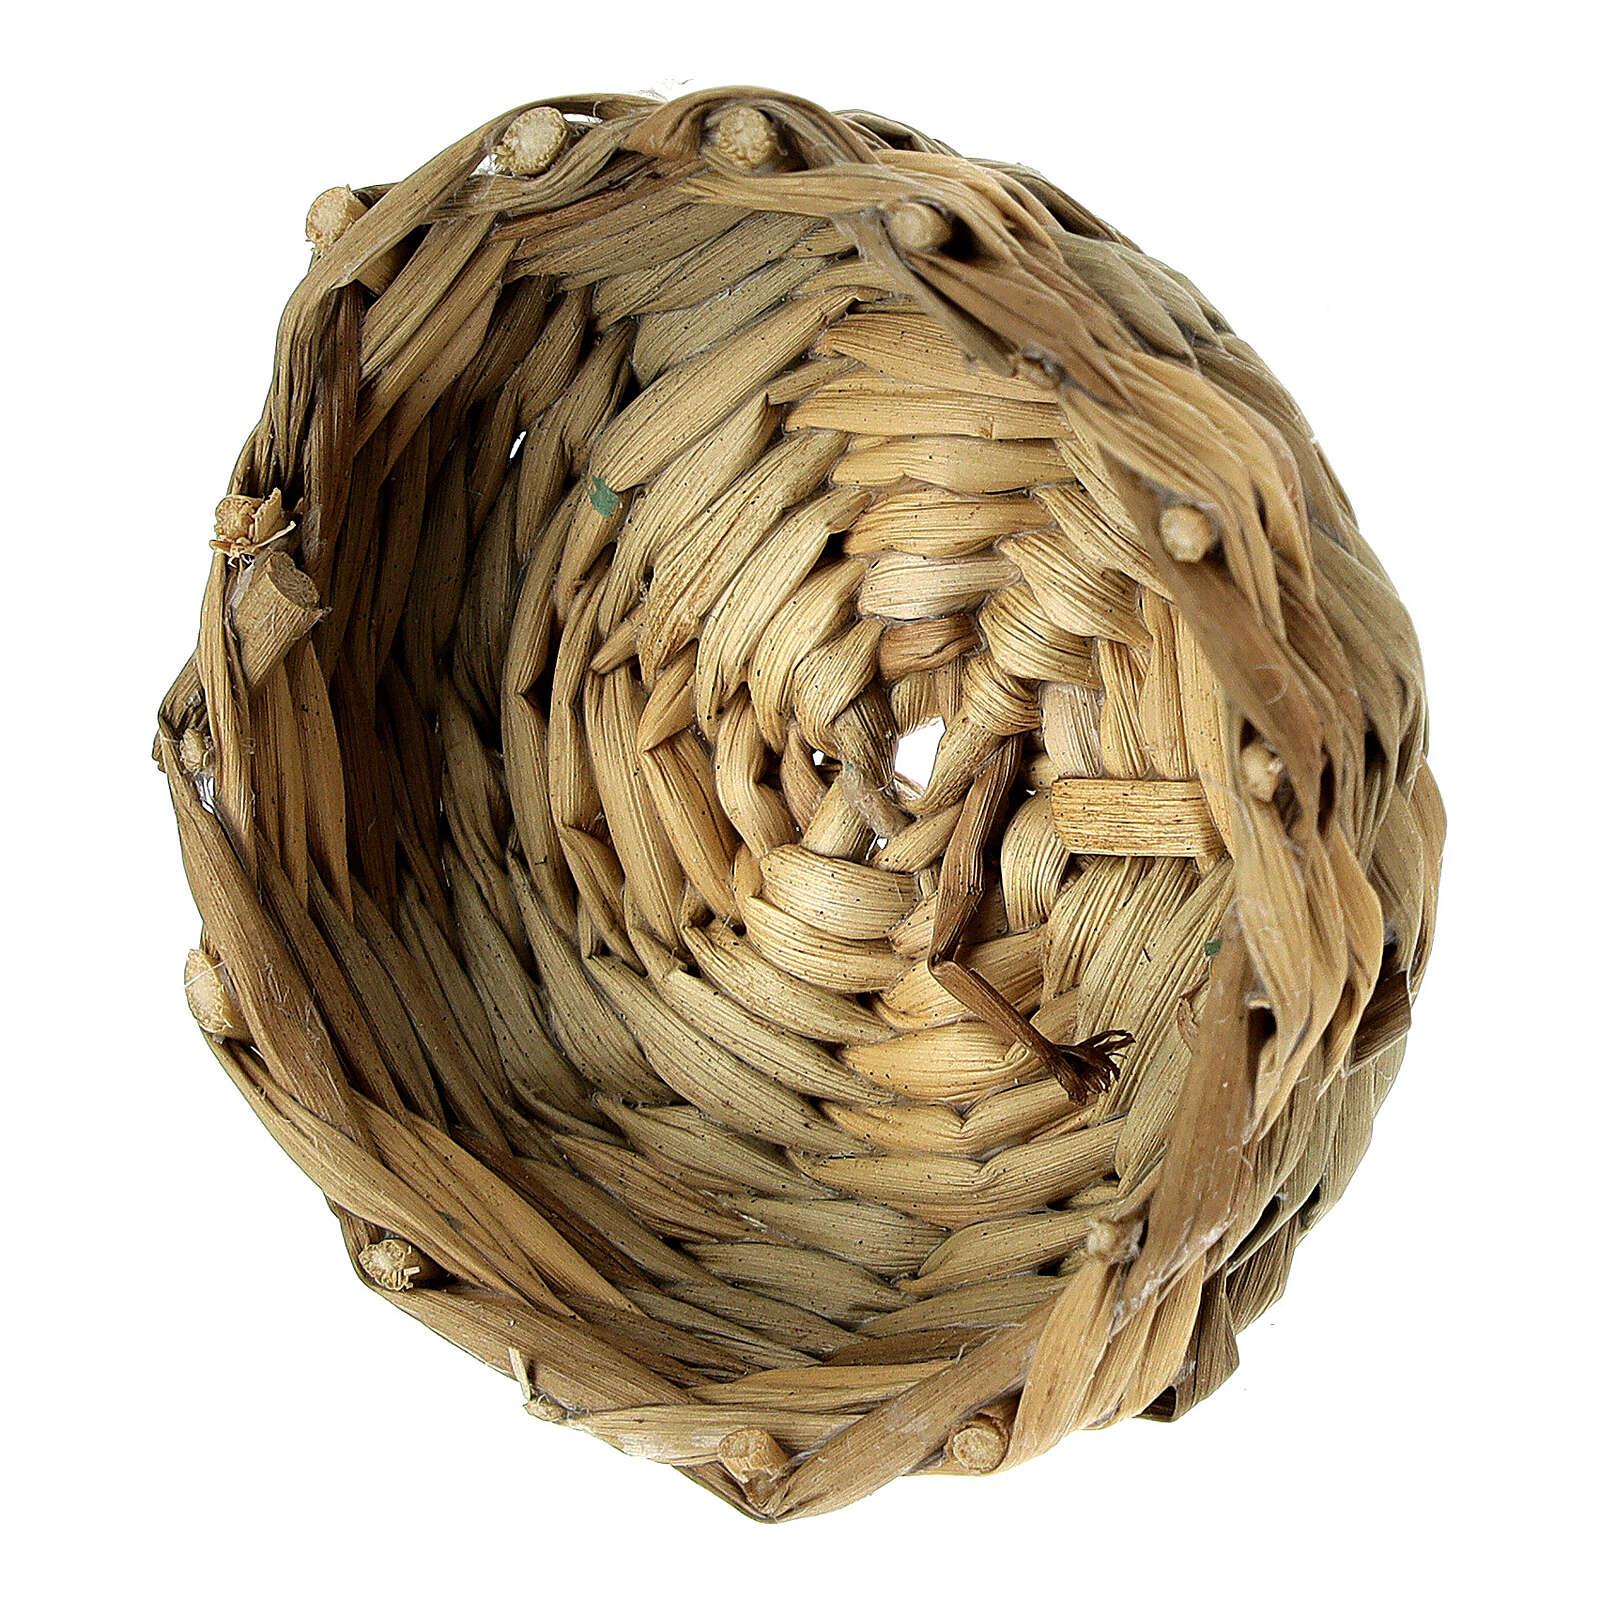 Low basket diam 4.5 cm for Nativity scenes 14-16-18 cm 4